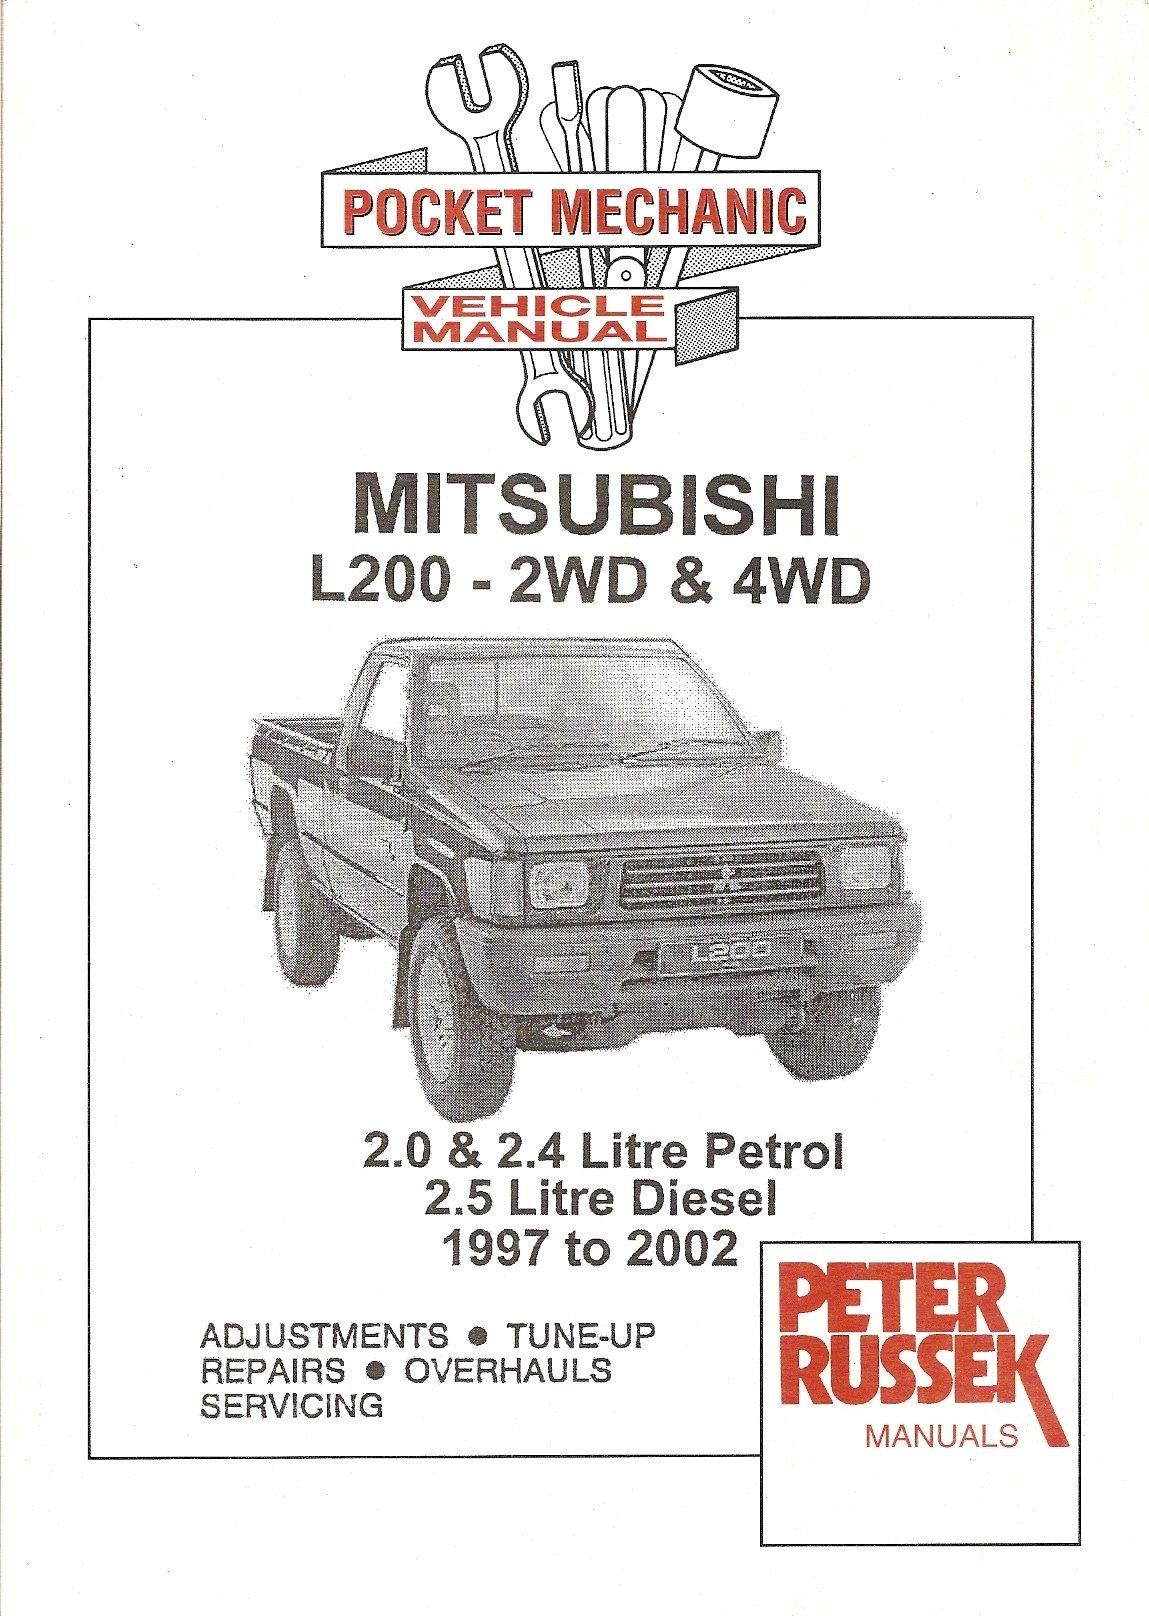 Pocket Mechanic Mitsubishi L200 2wd 4wd 1997 2002 Manual Amazon Wiring Diagram For Peter Russek Publications Ltd 9781898780519 Books